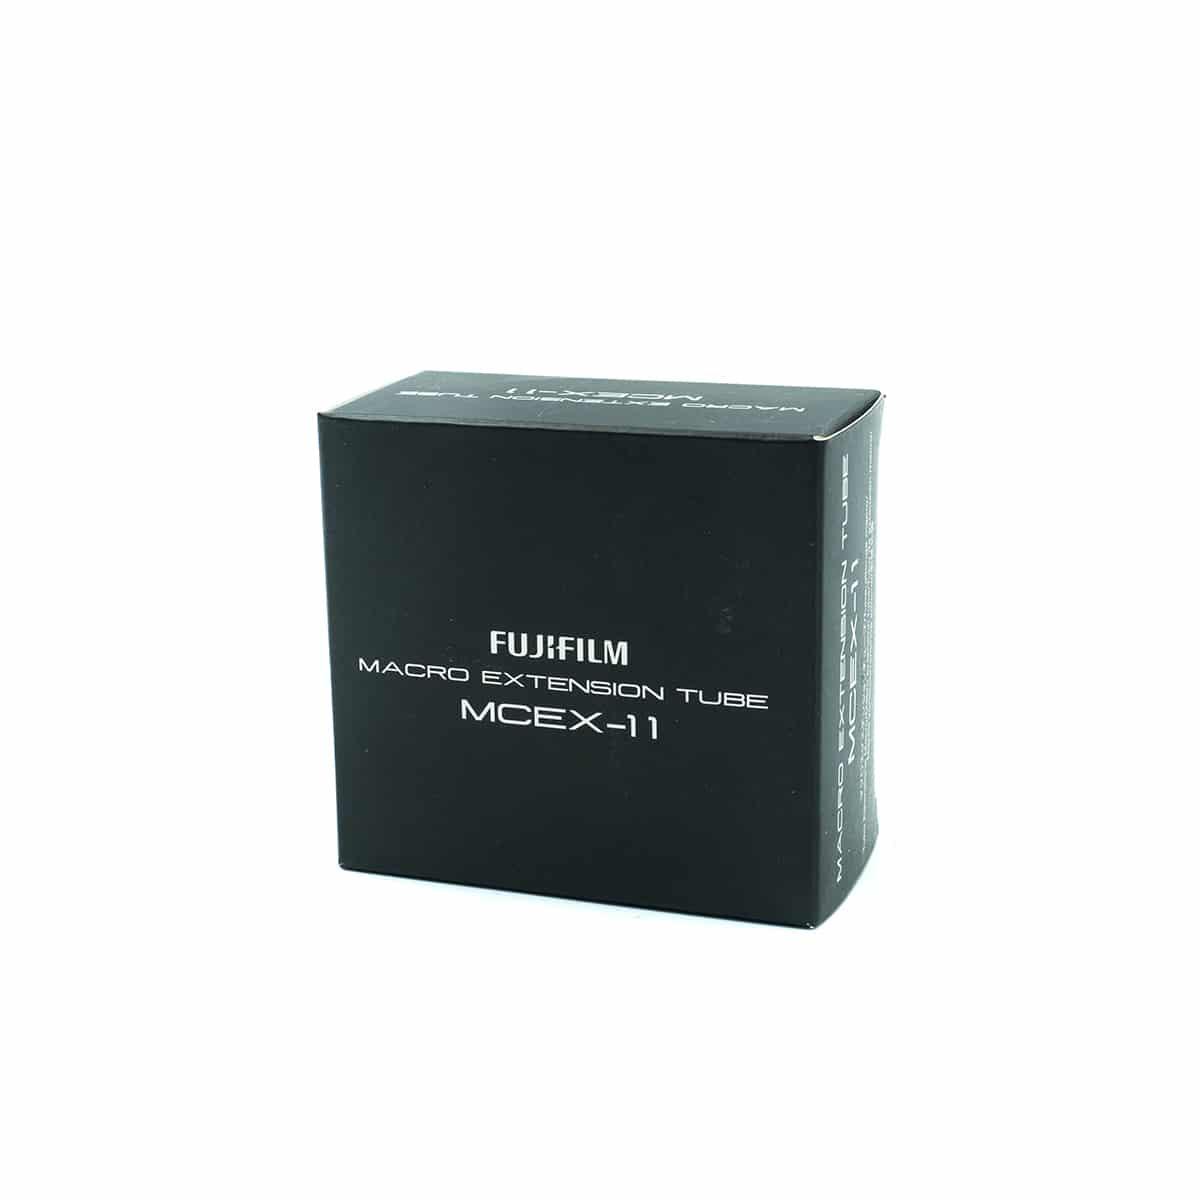 fujifilm macro extension tube mcex-11